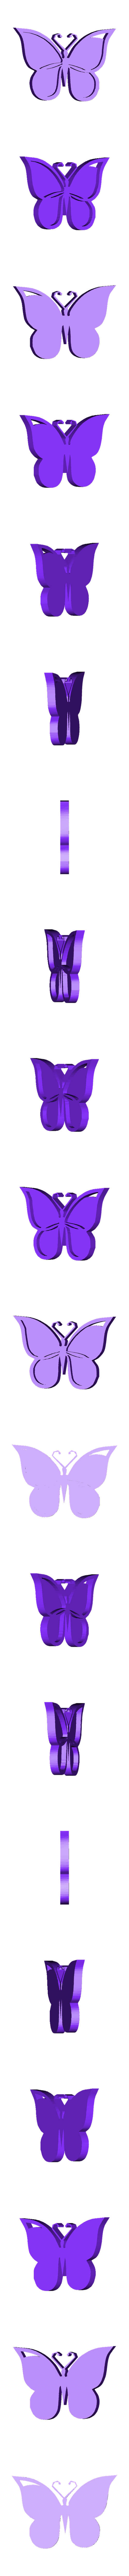 Mariposa_SOOLA.STL Download free STL file Butterfly • 3D printer model, ledblue